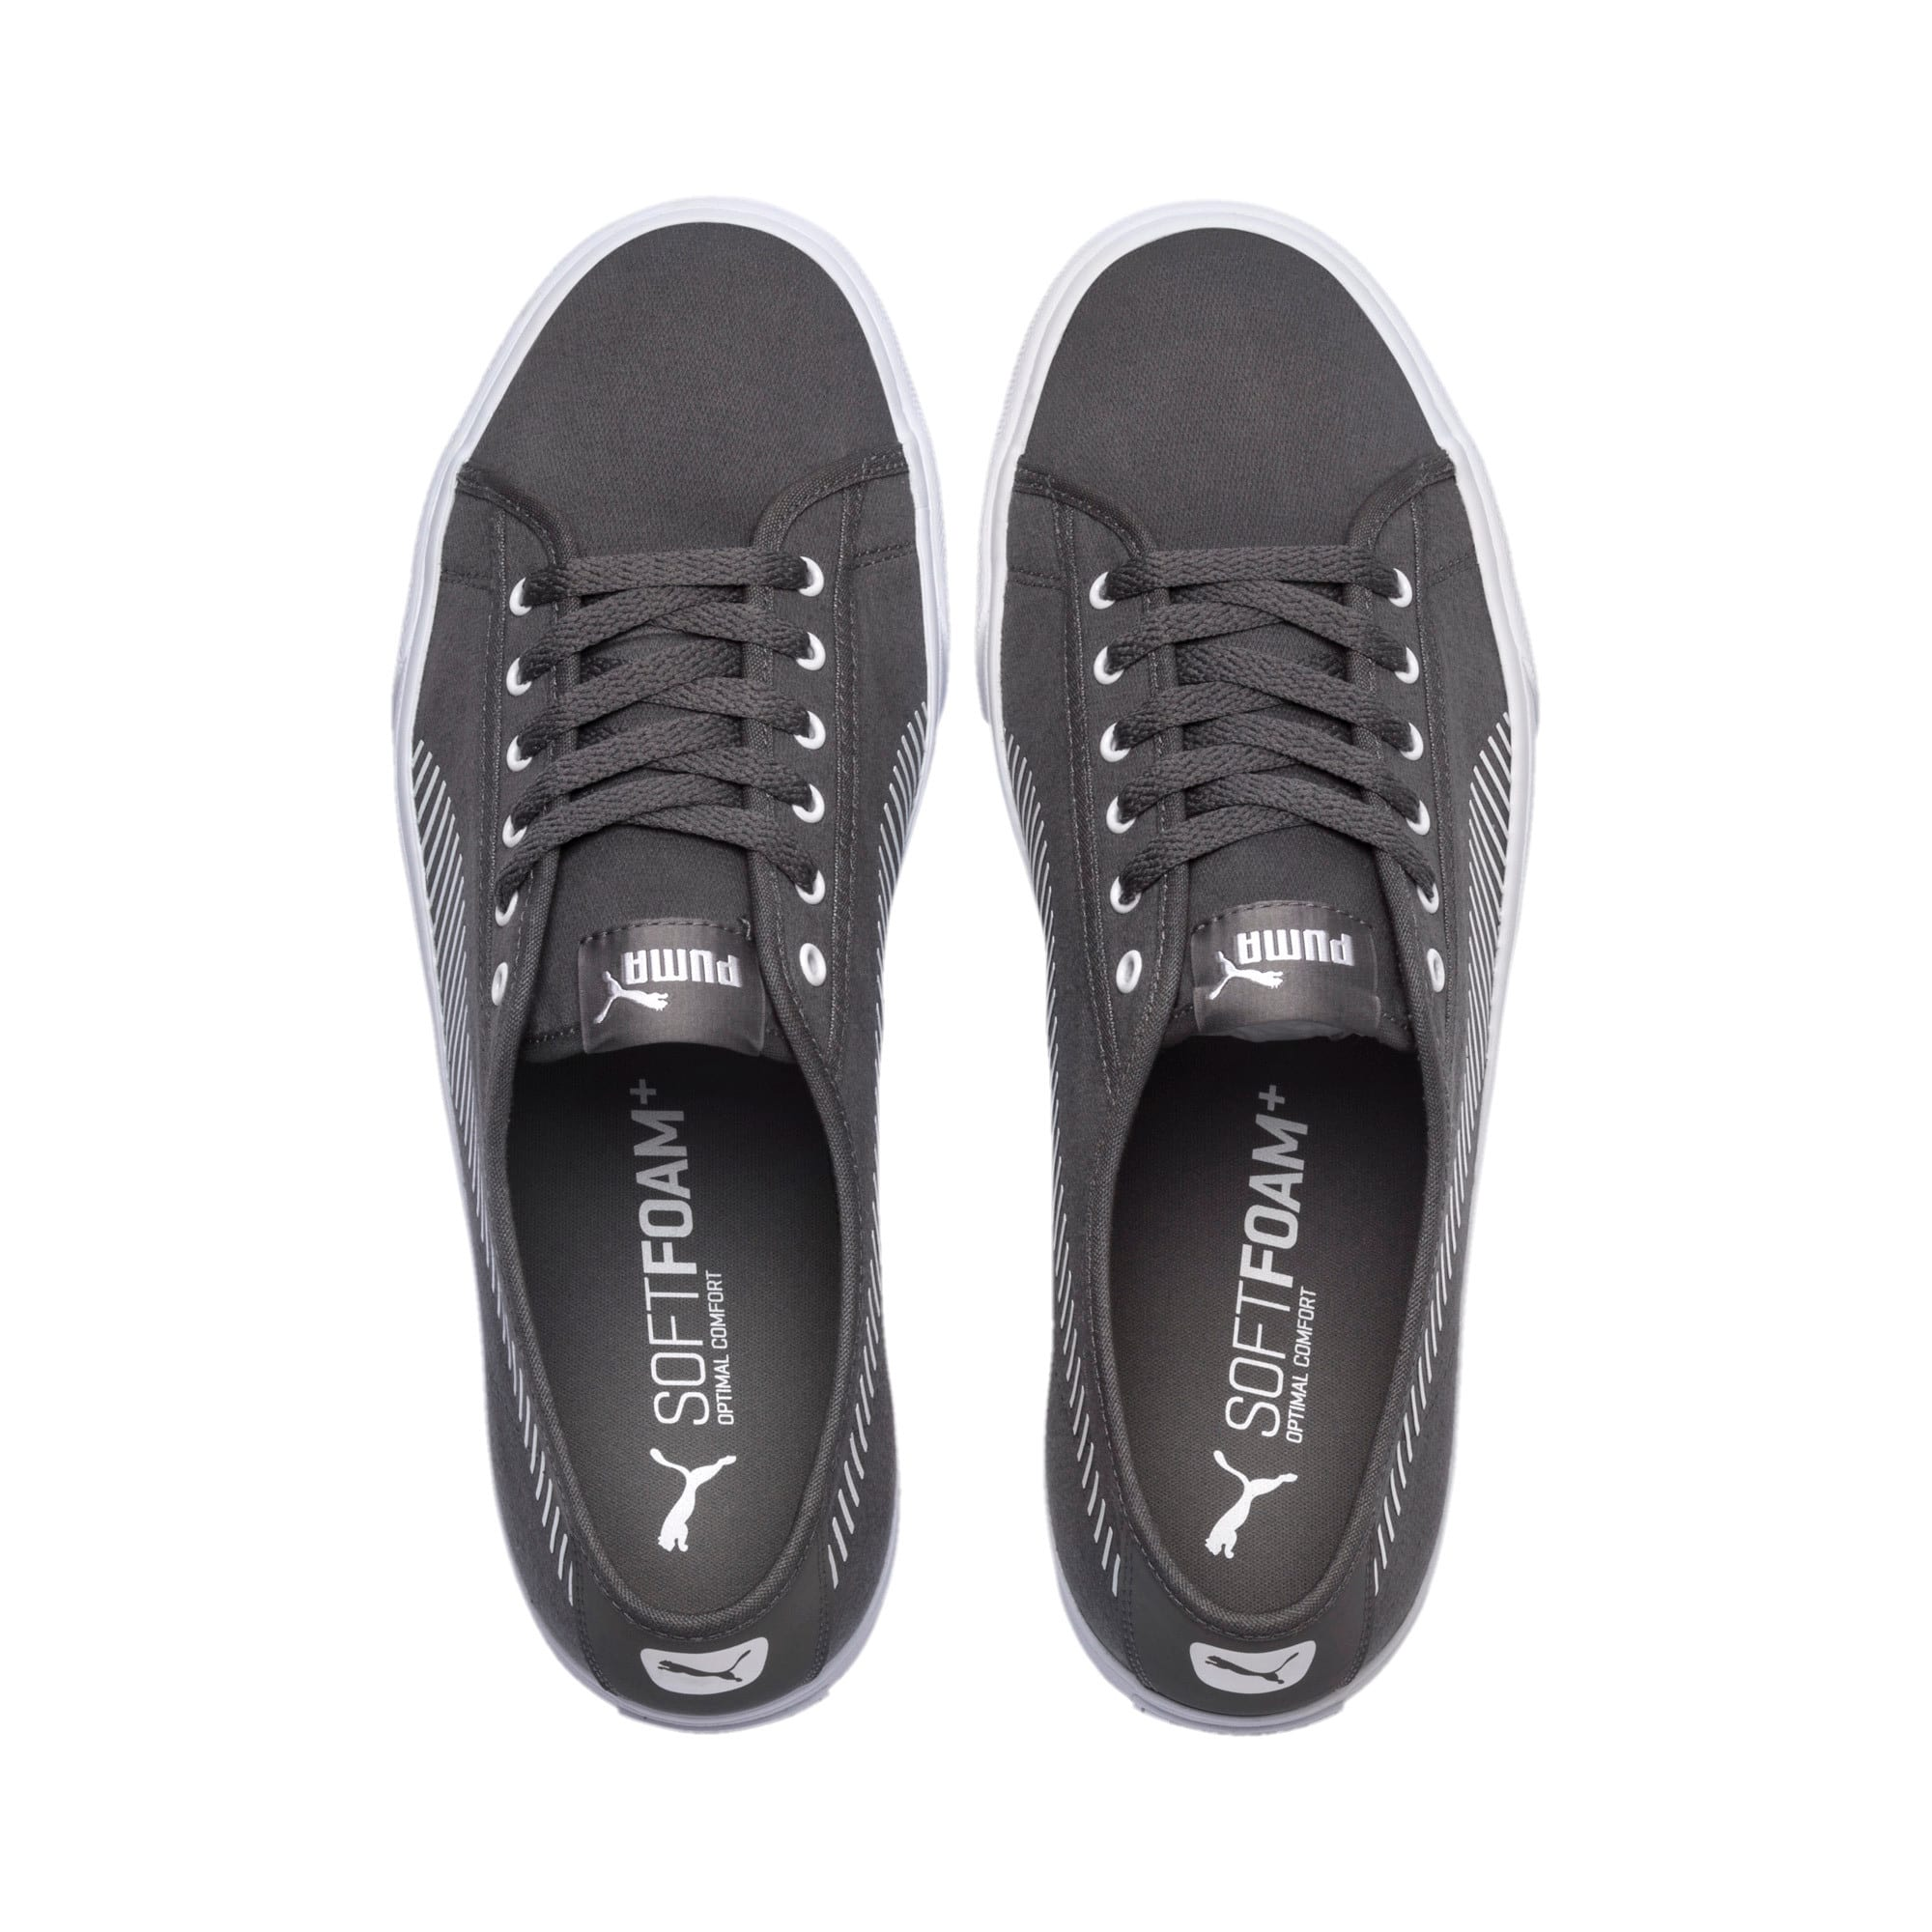 Thumbnail 6 of Bari Sneakers, Charcoal Gray-Puma White, medium-IND